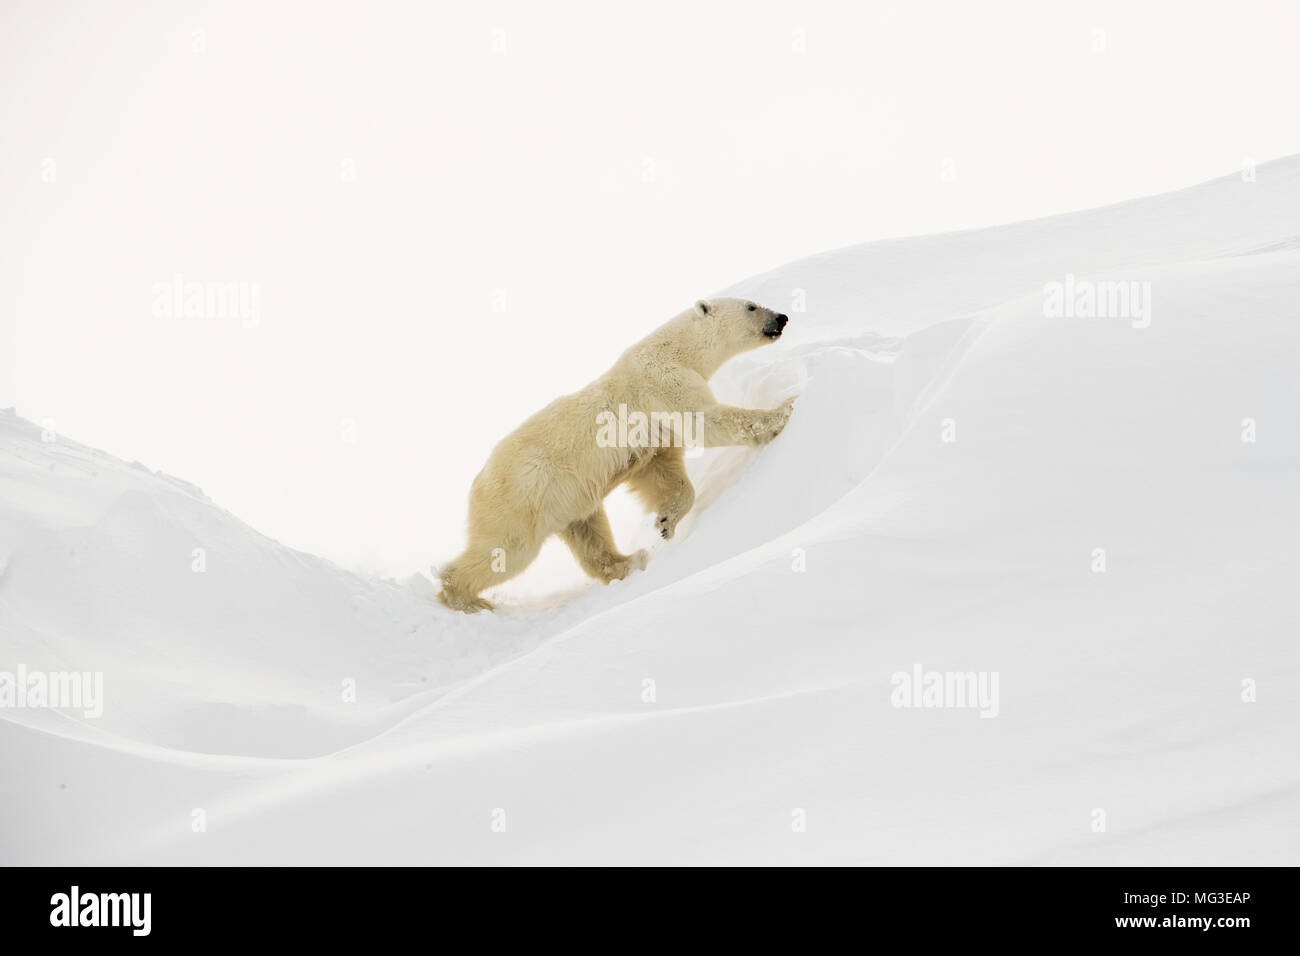 Large female polar bear climbs up a slot in an iceberg.  Baffin Island, nunavut, canada, arctic - Stock Image